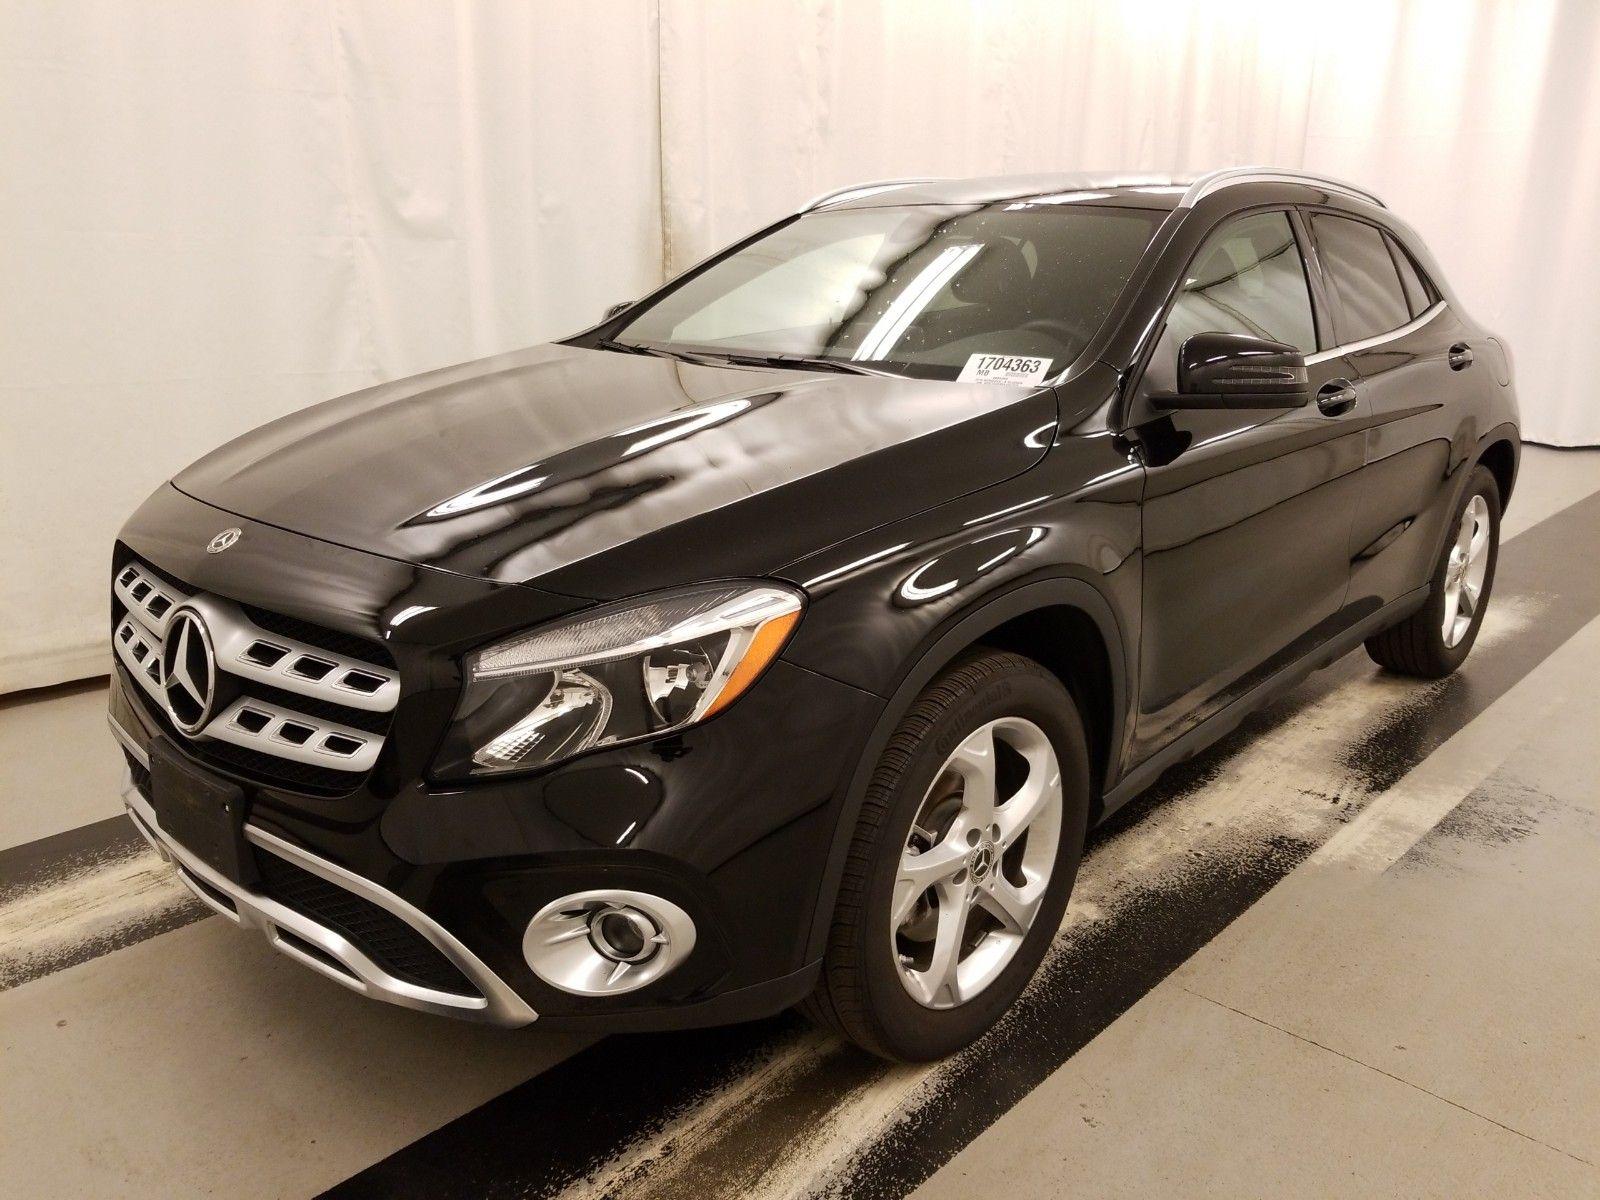 2019 Mercedes-benz Gla 2.0. Lot 99912133915 Vin WDCTG4EB0KJ551532